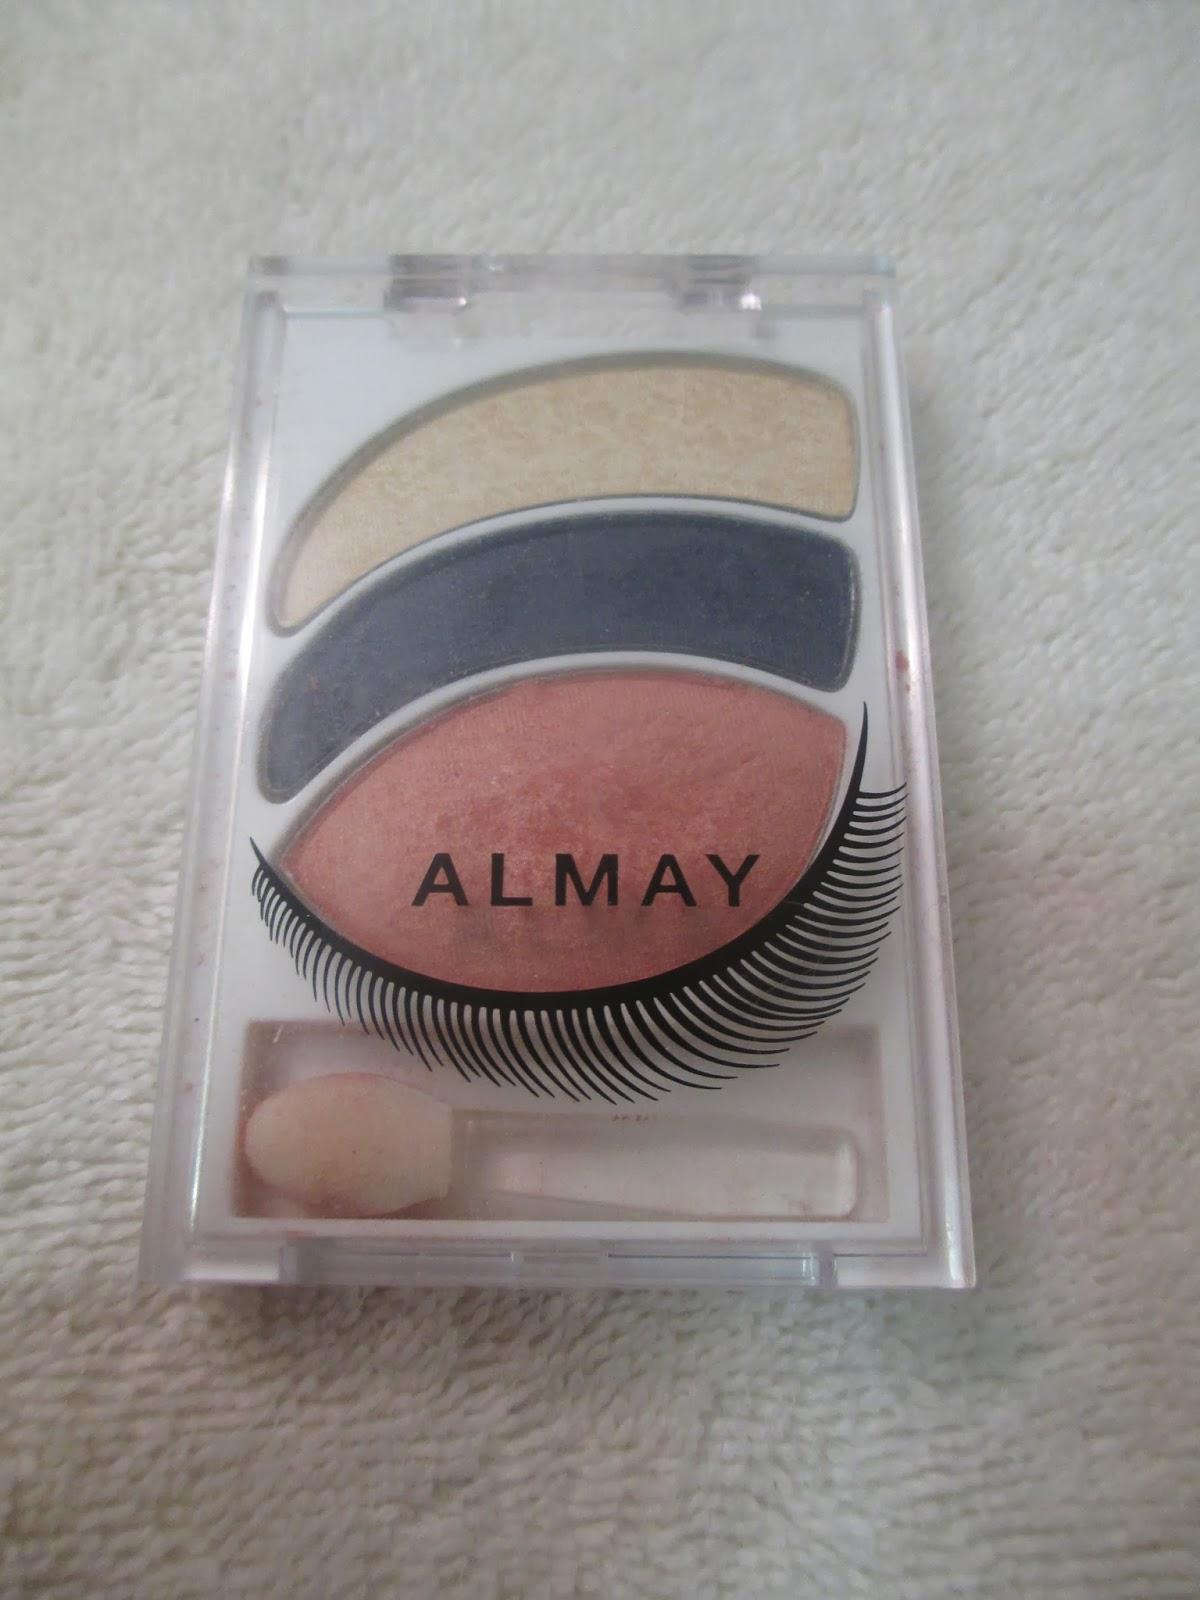 almay bold nudes for hazel eyes intense i-color kit review+